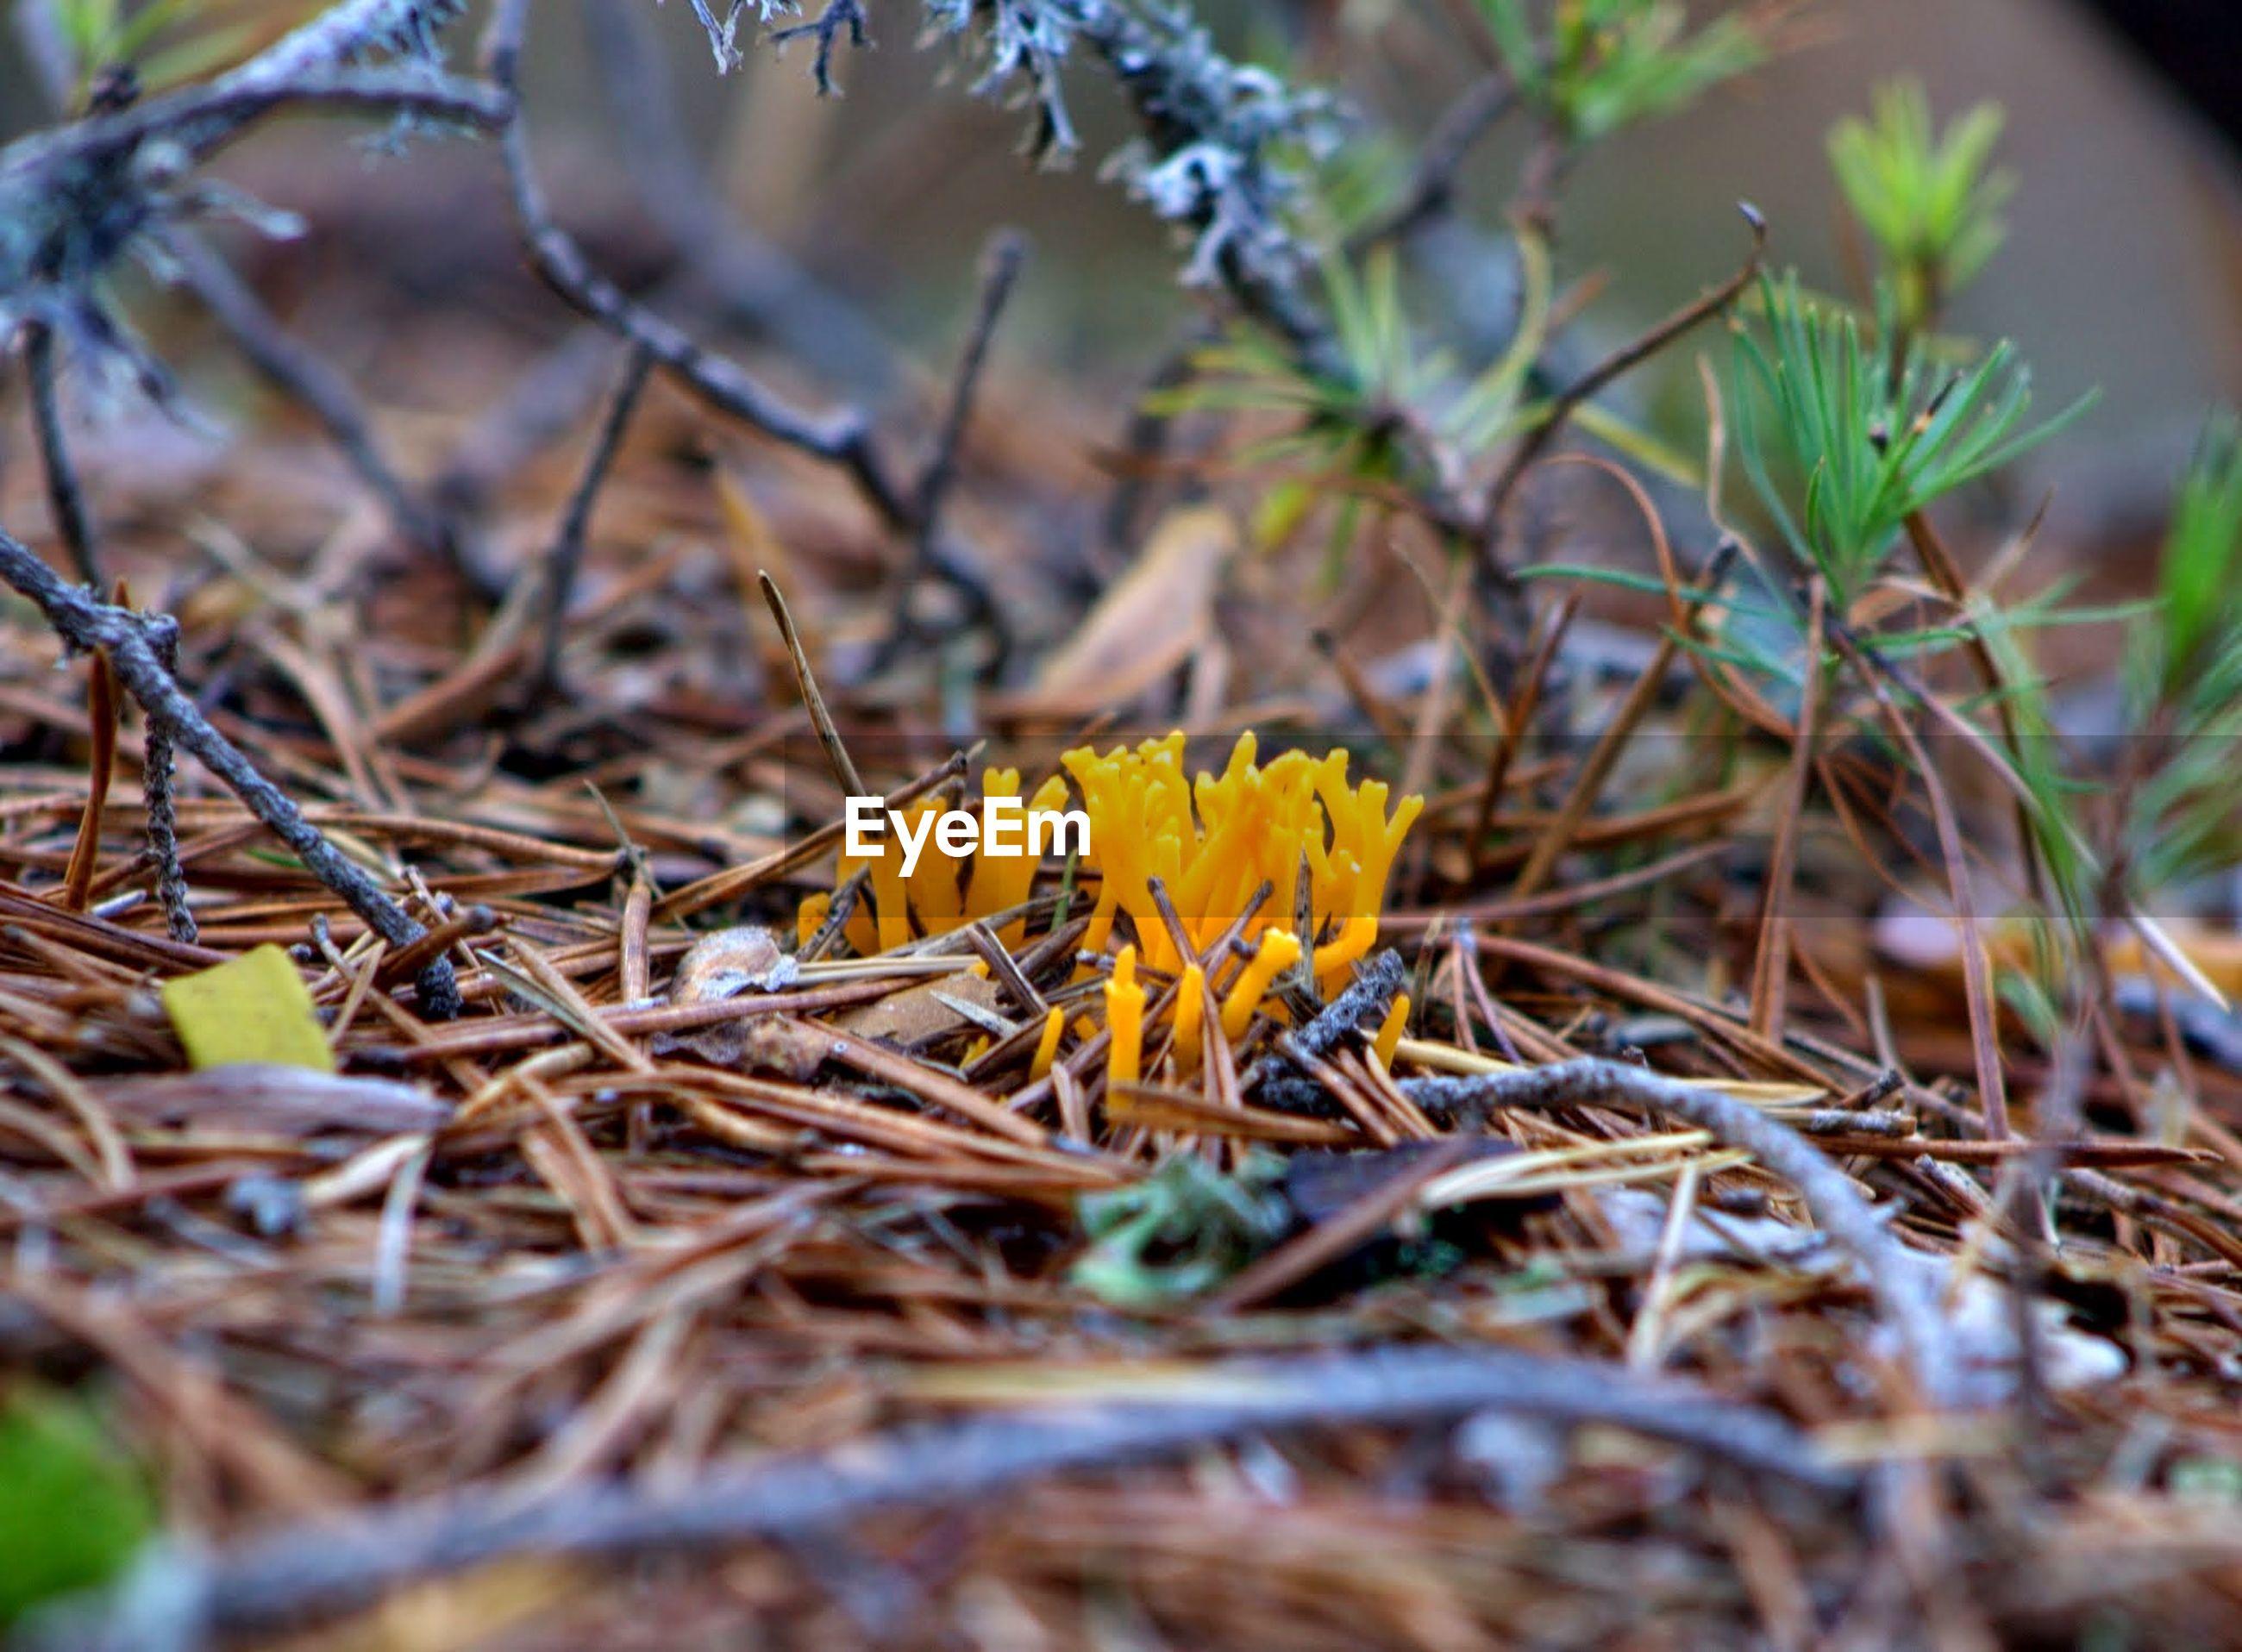 CLOSE-UP OF YELLOW CROCUS PLANT